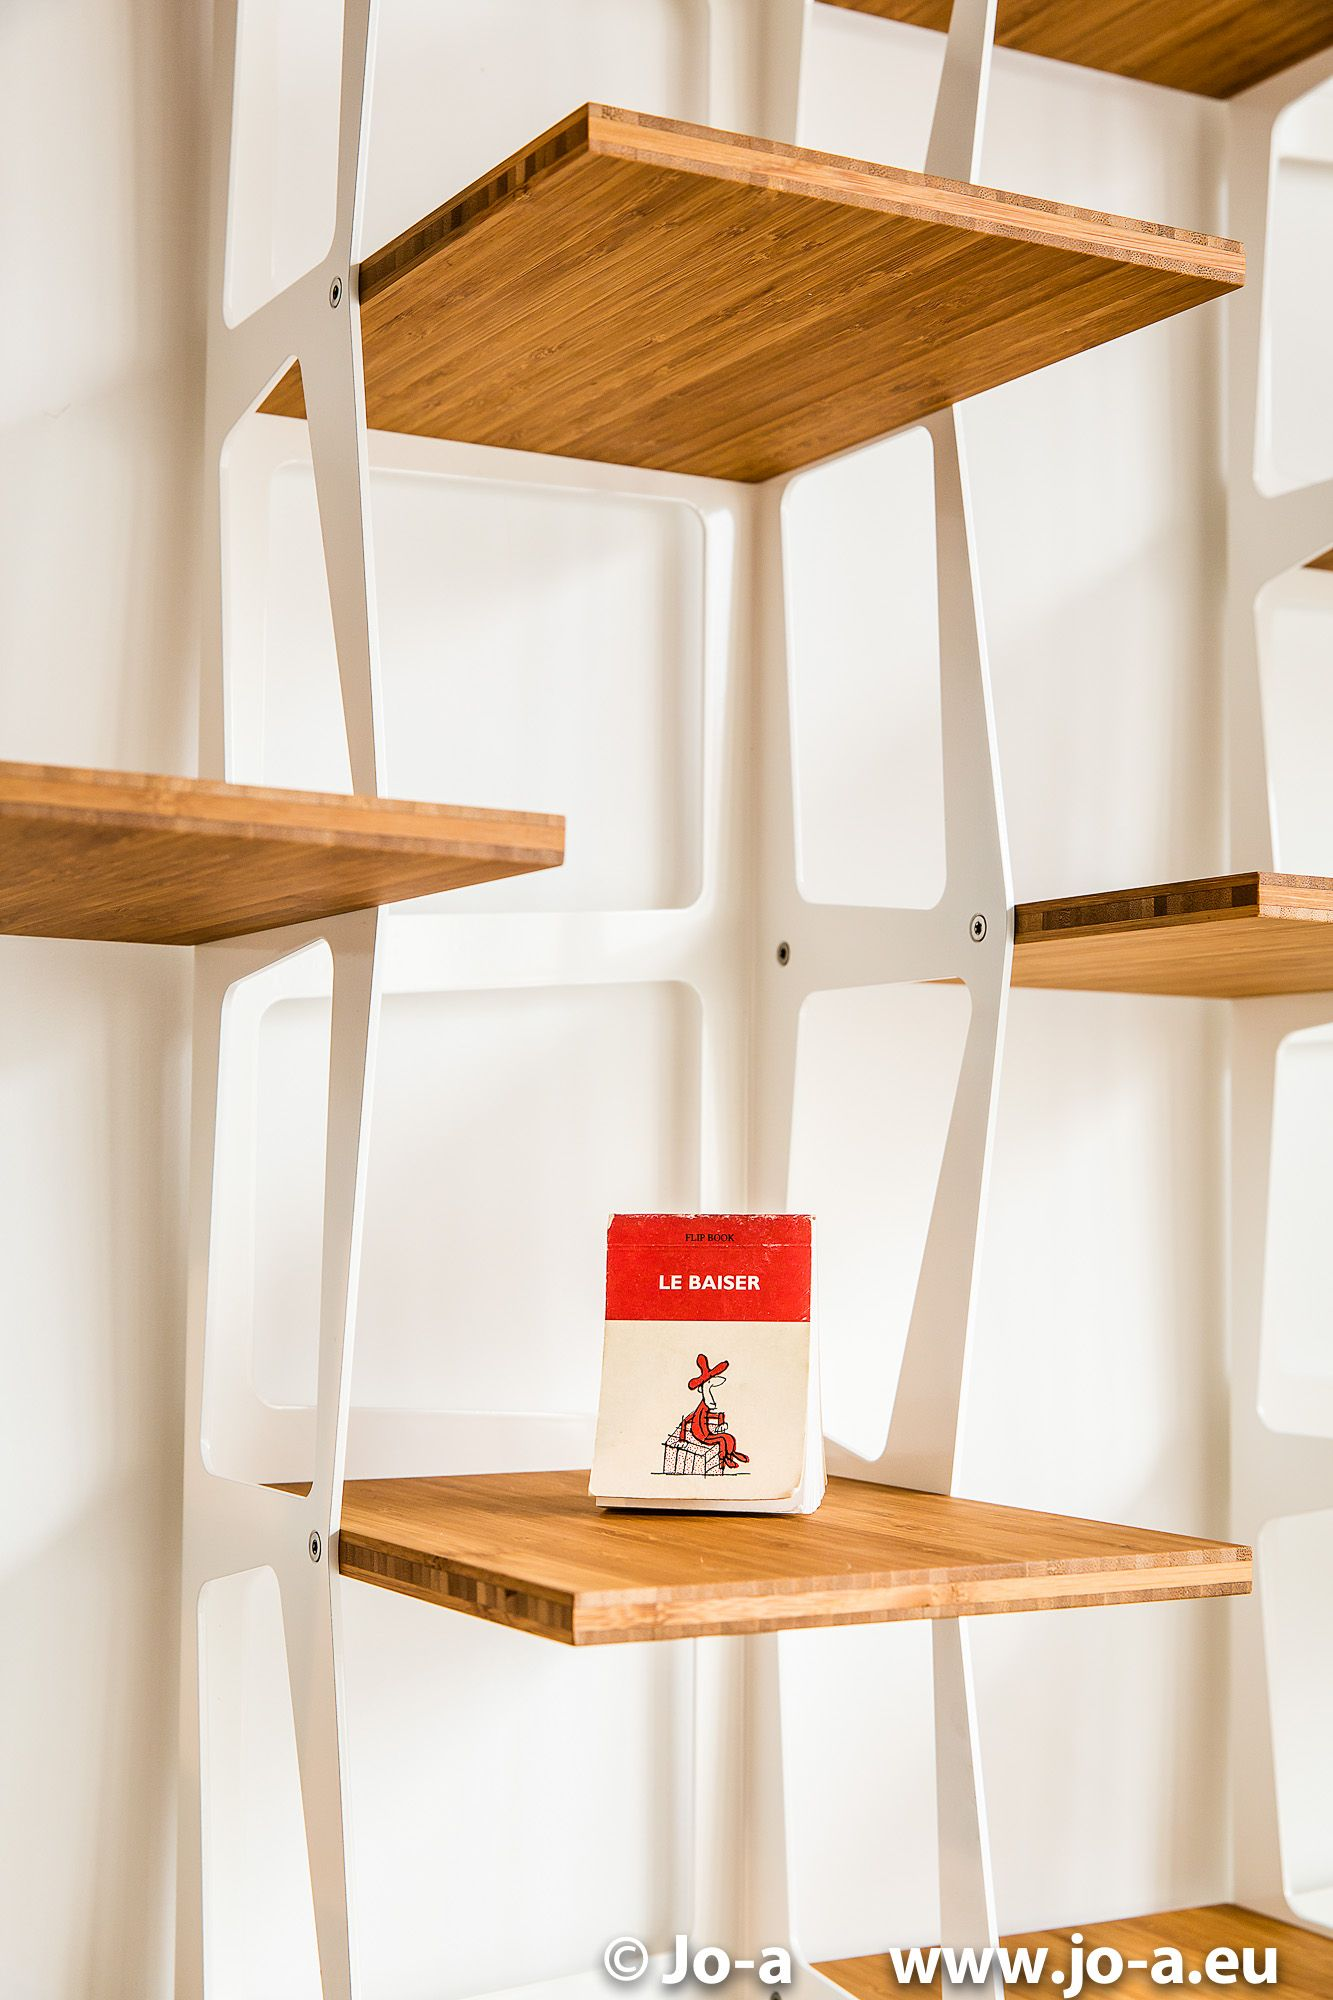 Cute Bookshelf cute isn't it? céli modular bookshelf - white design shelving